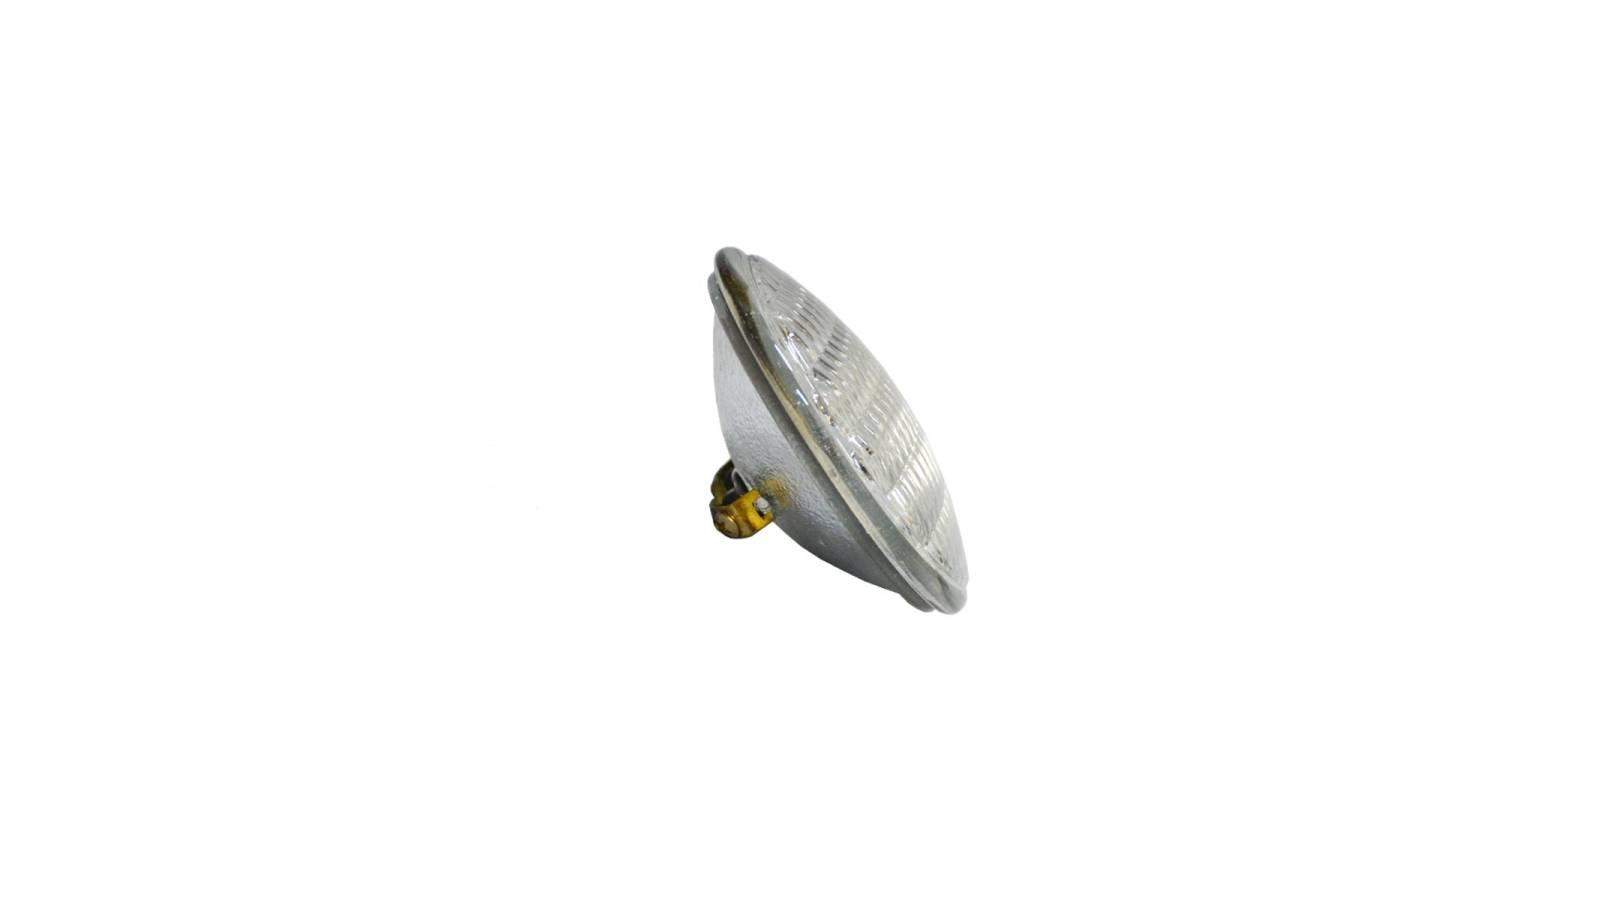 Lampara Para Mini Brut Par 36 120v/650w Gcm Pro